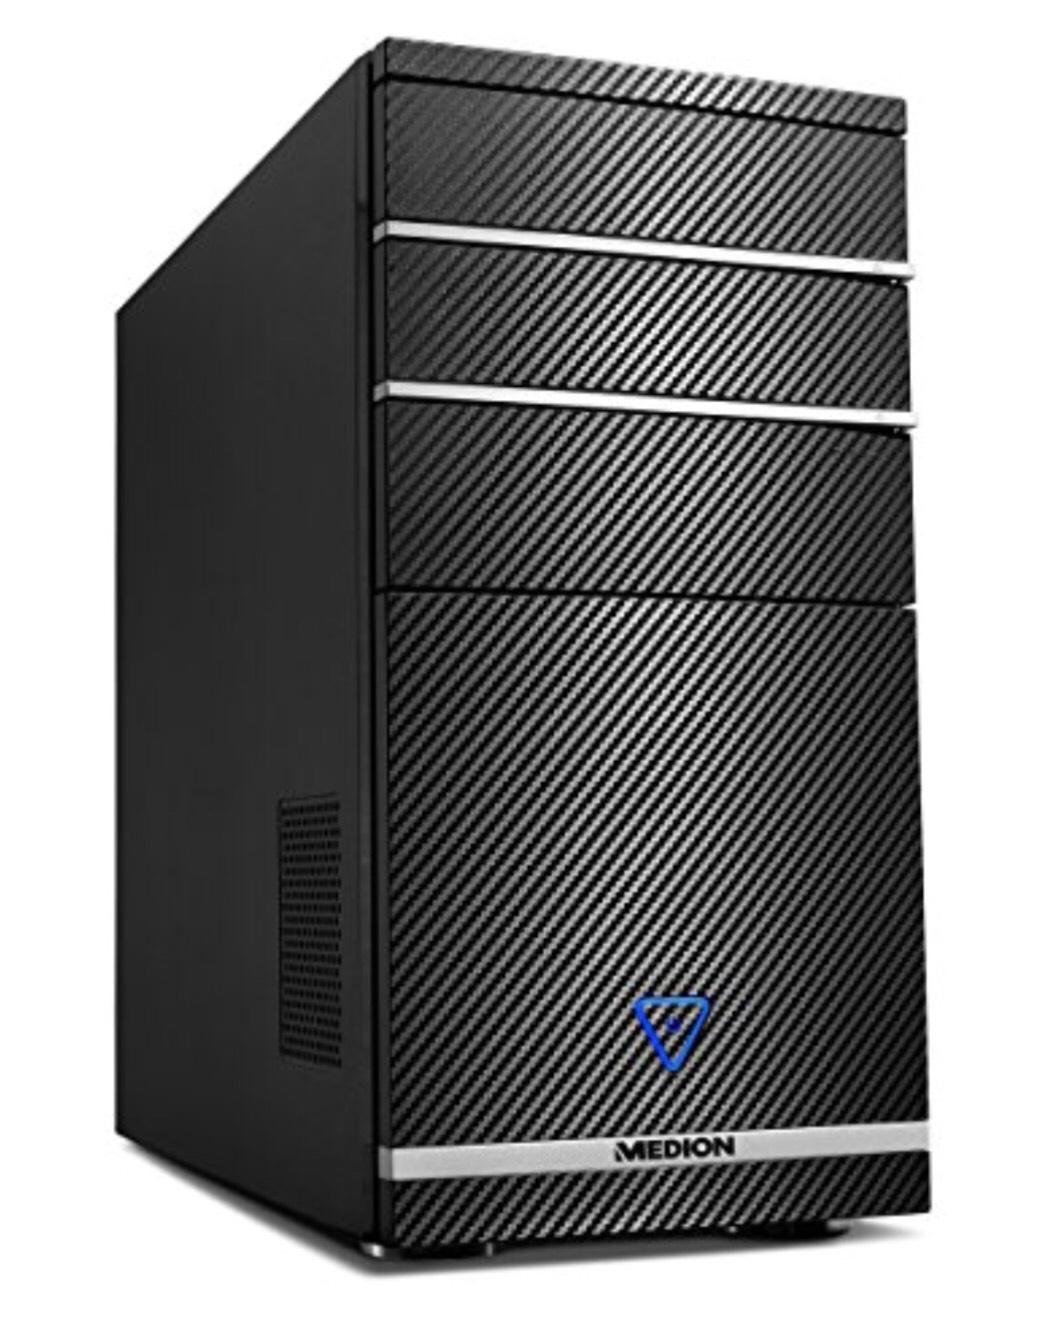 PC de bureau Medion Akoya P66023 - Intel Core I5-8400, 8Go de RAM, 128Go SSD + 1To HDD, GTX 1050Ti